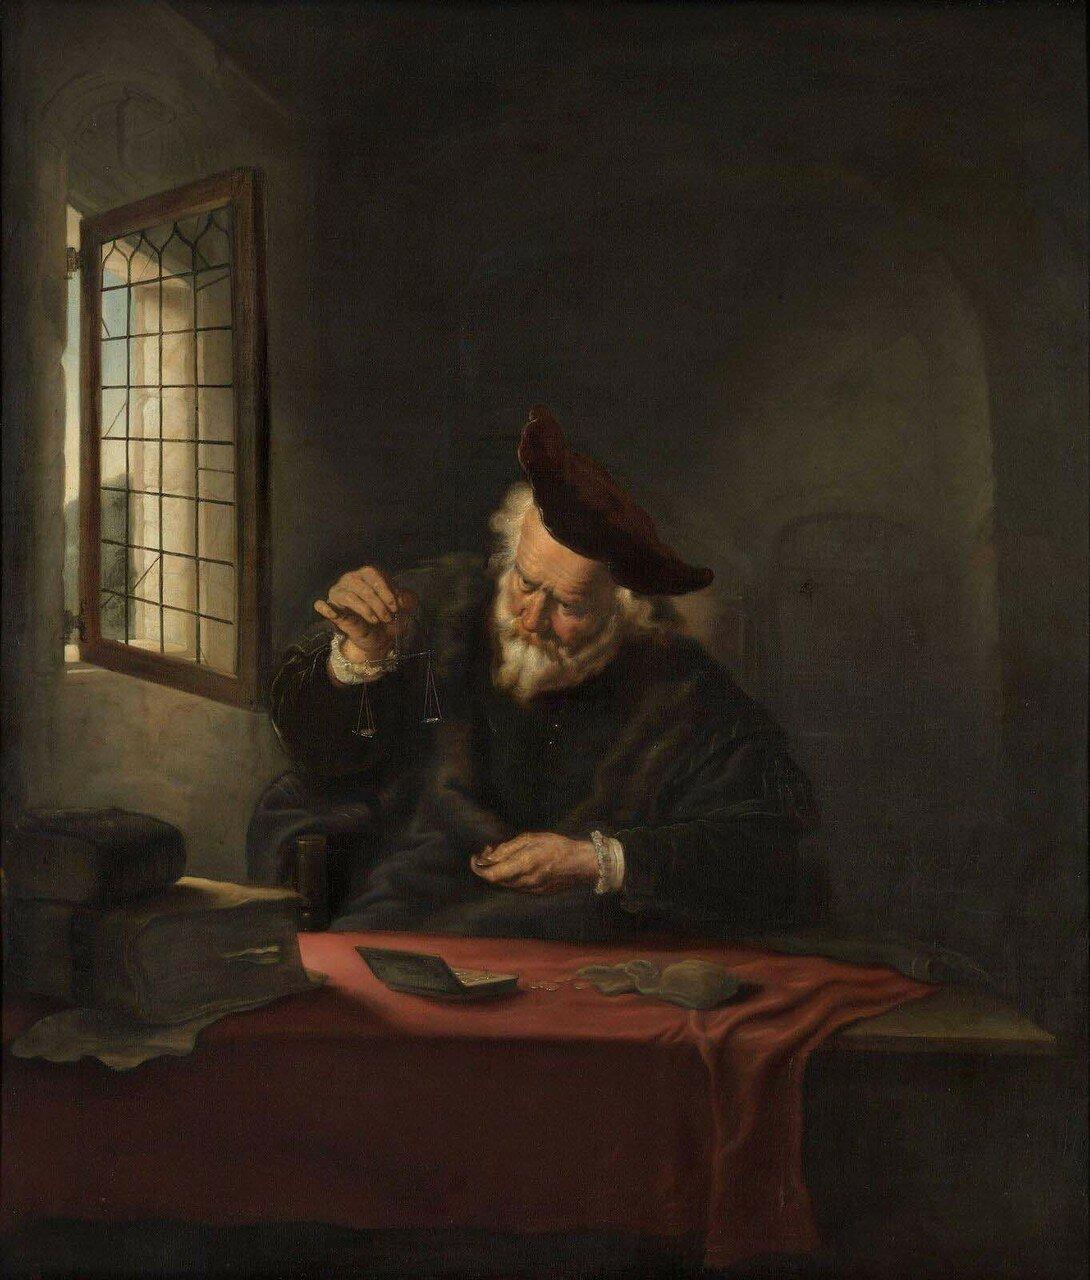 1654_Весовщик (The gold-weigher)_75.7 х 64_х.,м._Роттердам, музей Бойманса ван Бёнингена.jpg